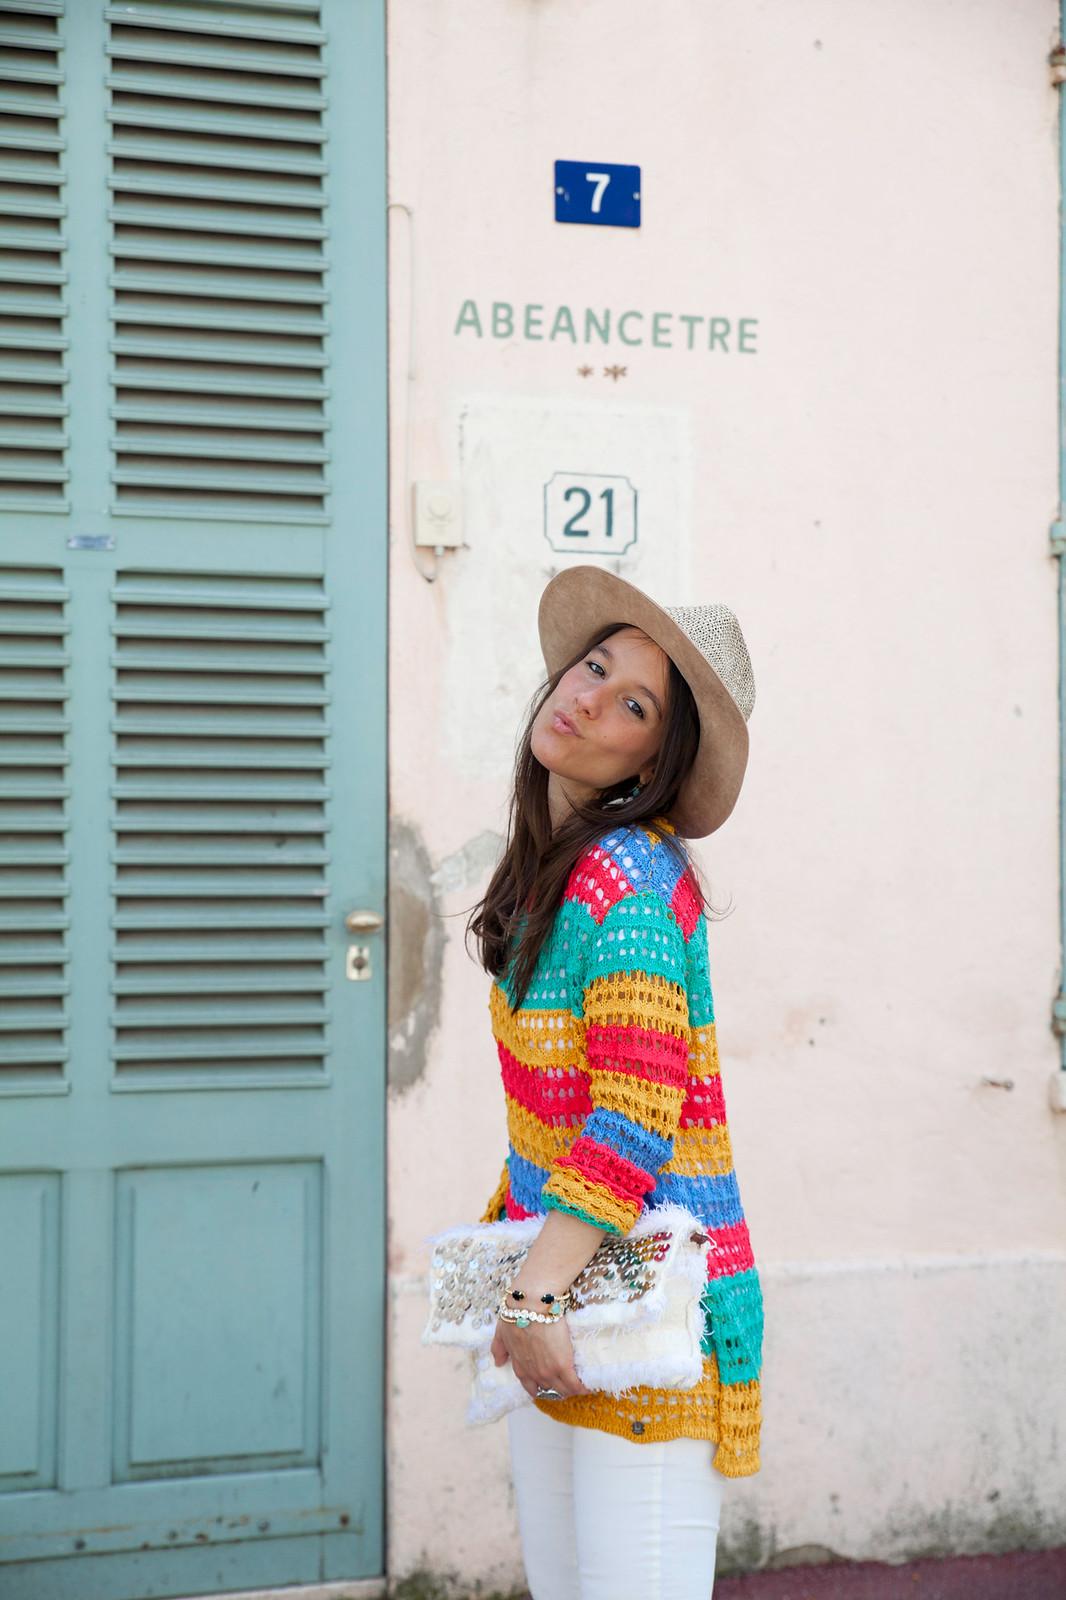 mas 34 stilletos colores fashion infuencer theguestgirl laura santolaria emprendedora tech crunch